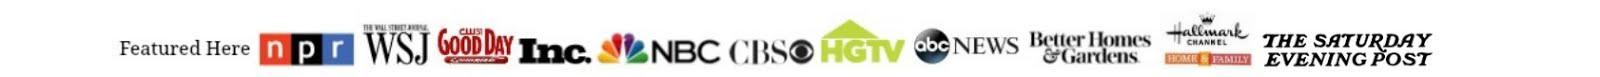 Lisa Steele featured on npr, WSJ, Inc., NBC, CBS, HGTV, abc News, Better Homes & Gardens, Hallmark Channel, The Saturday Evening Post